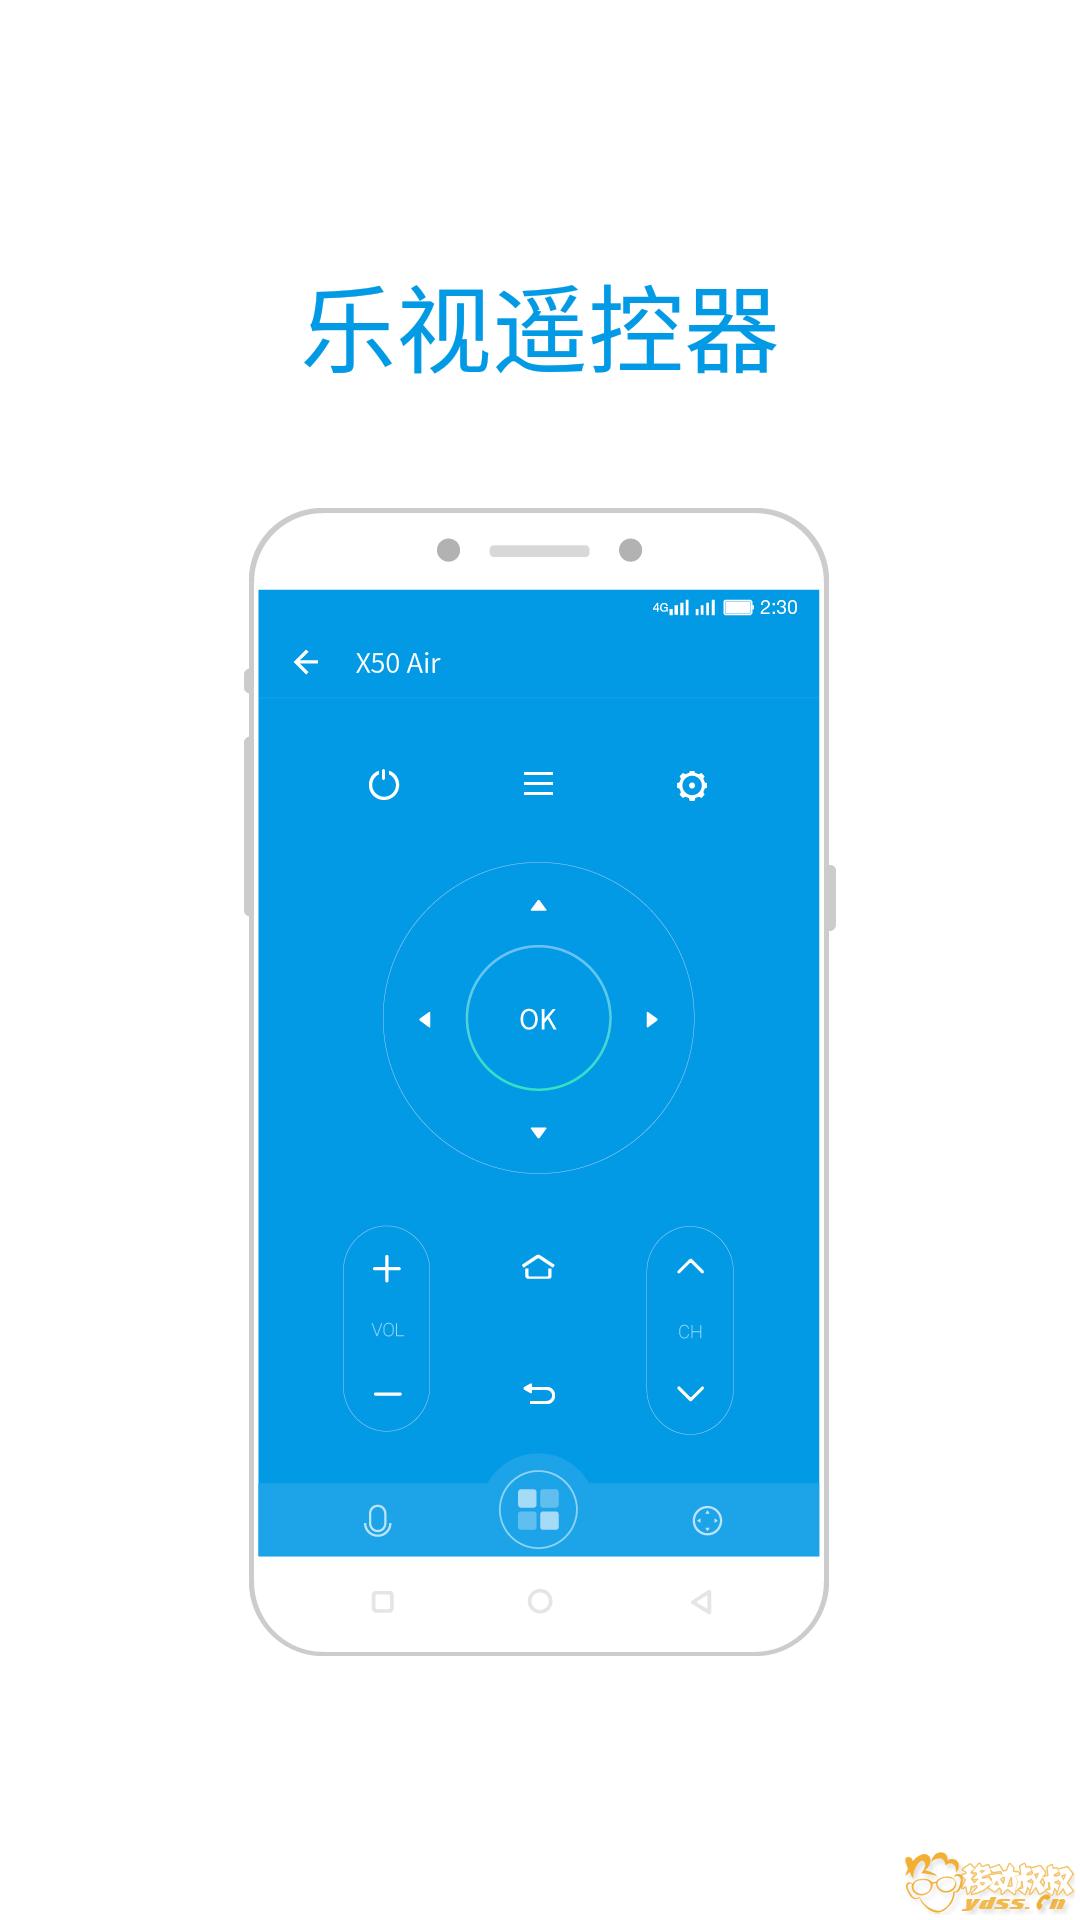 Screenshot_2018-03-12-14-33-05-520_com.letv.android.remotecontrol.png